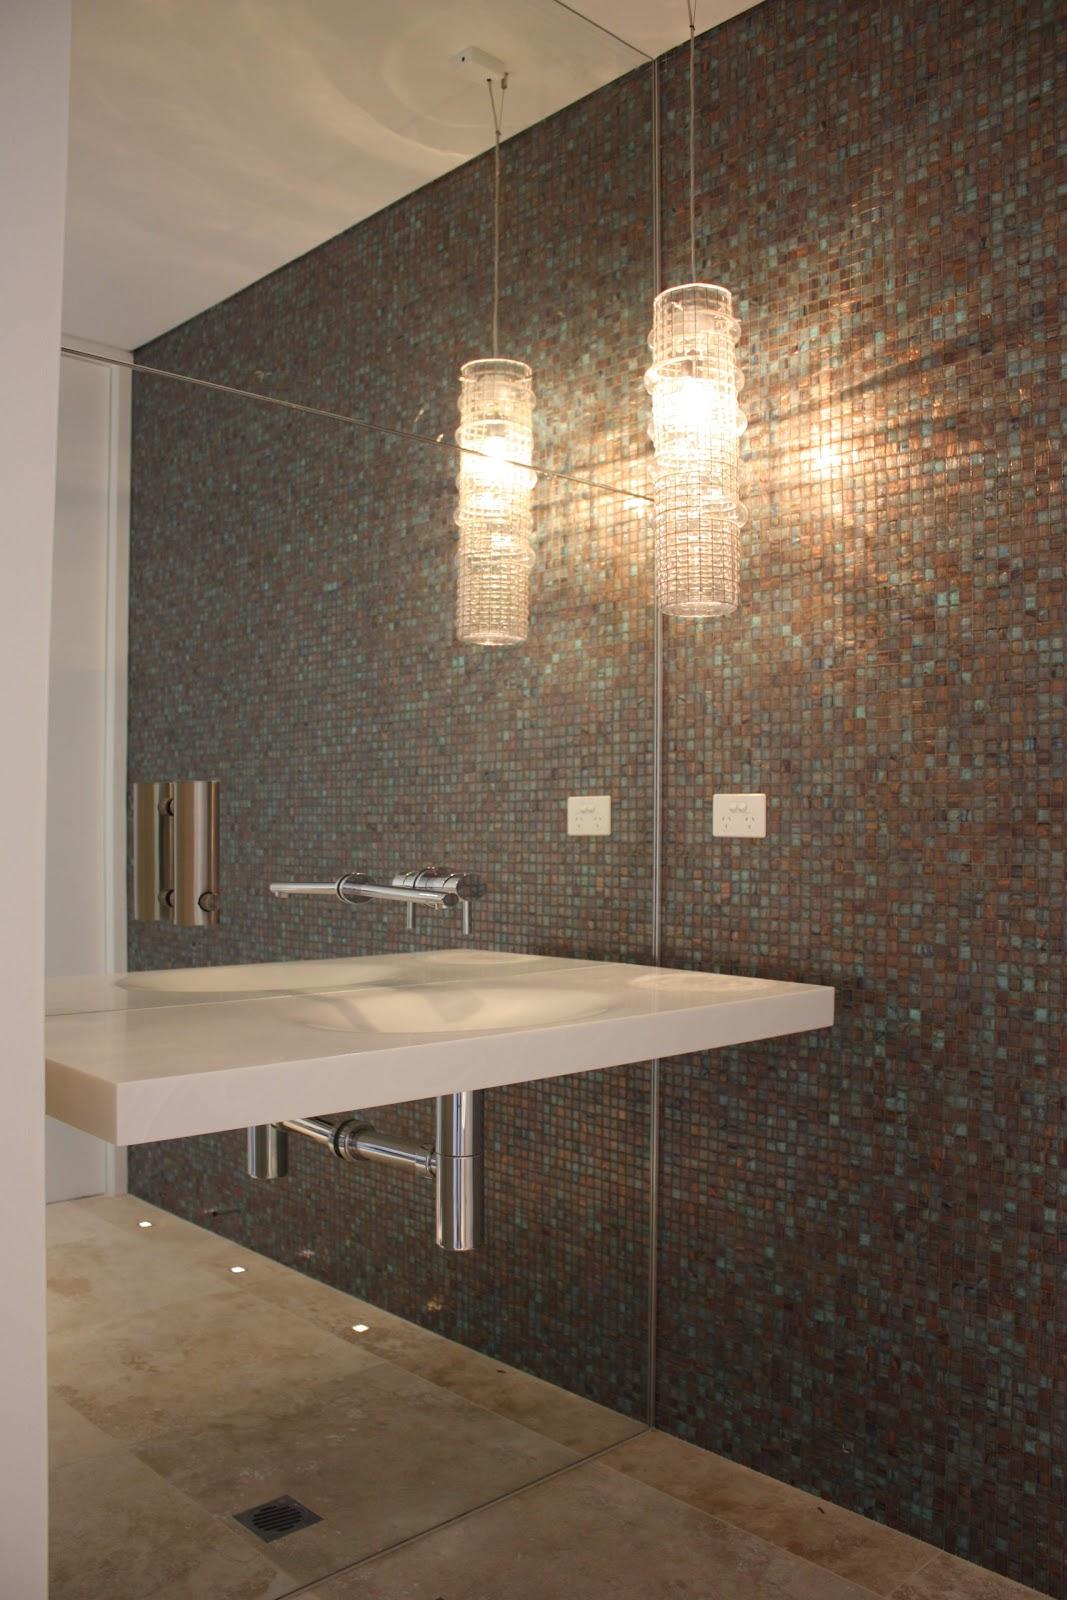 Minosa Travertine Bathrooms The Natural Choice Modern Design